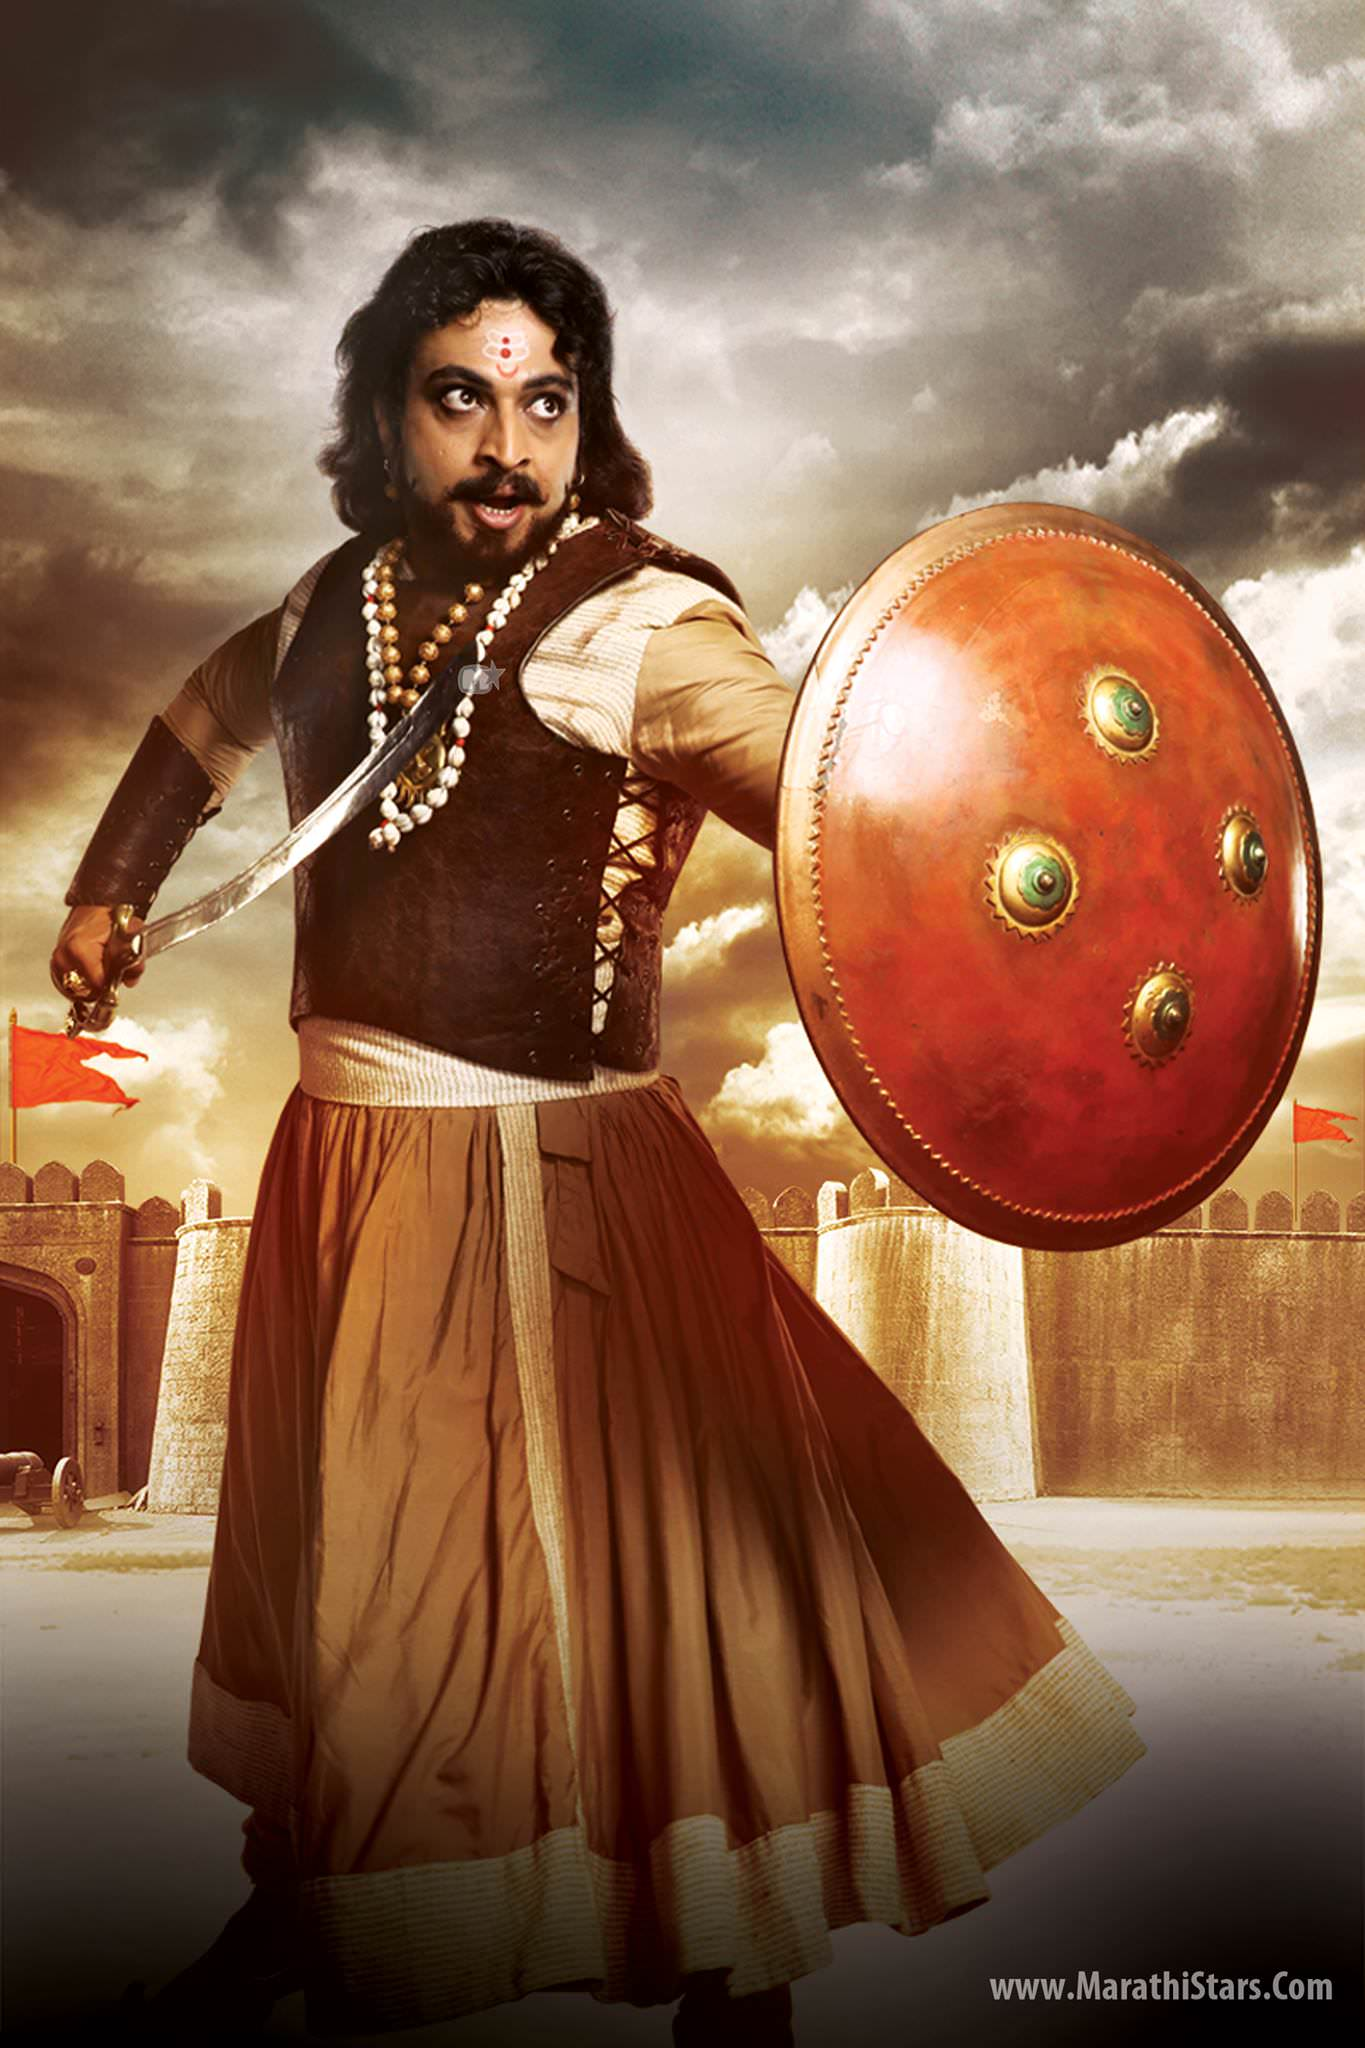 Sambhaji Maharaj Zee Marathi Serial Promo - Sambhaji Maharaj Zee Marathi , HD Wallpaper & Backgrounds